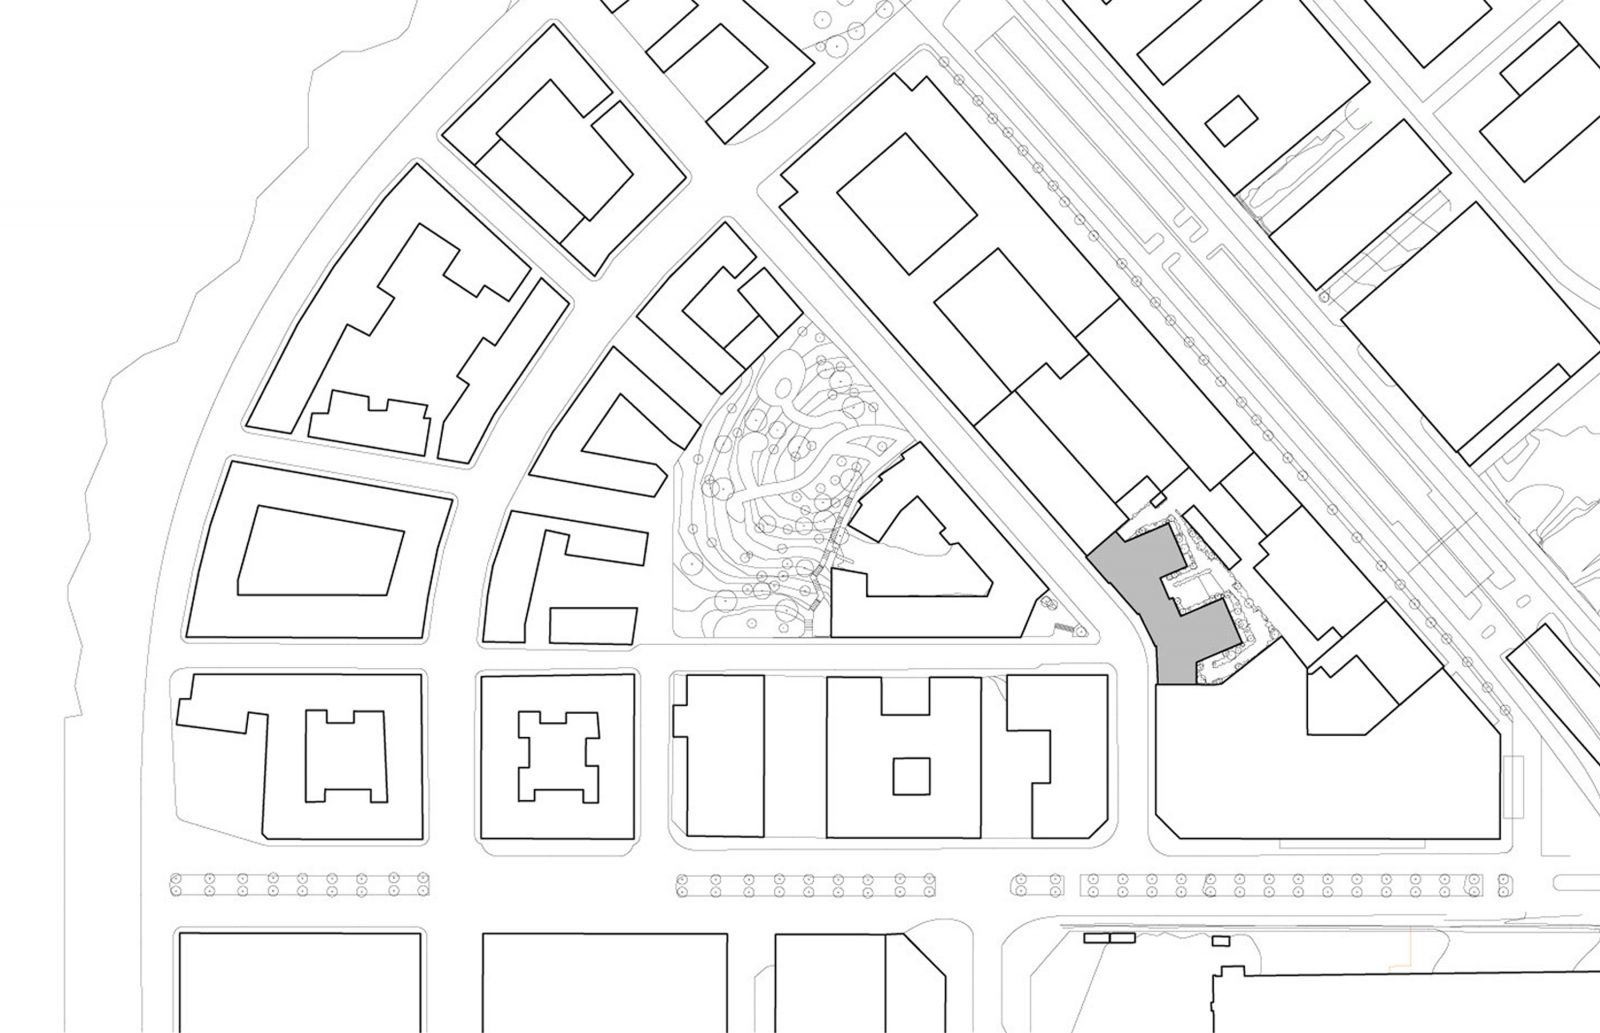 KjellanderSjoberg Etaget Drawing Siteplan 3600x2324